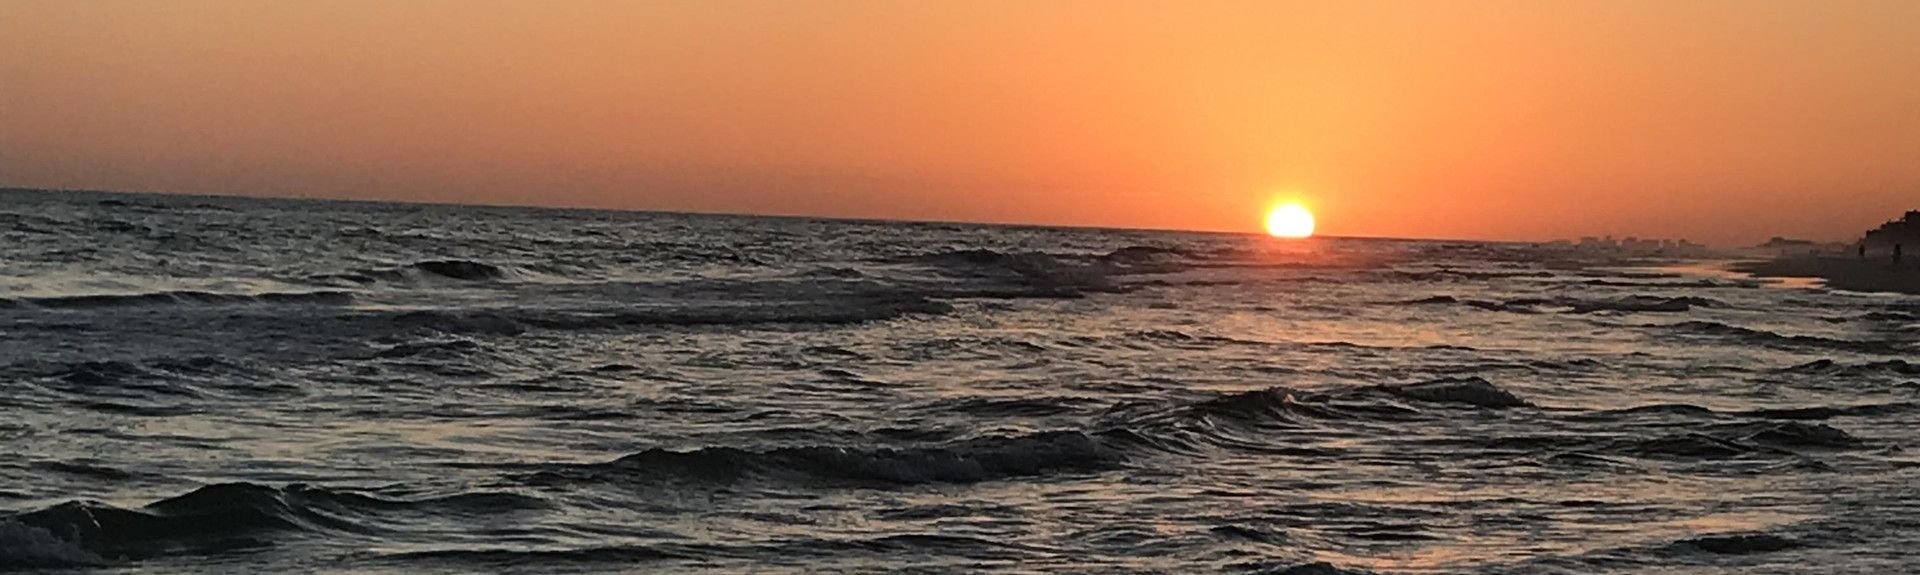 Eastern Shores (Santa Rosa Beach, Floryda, Stany Zjednoczone)